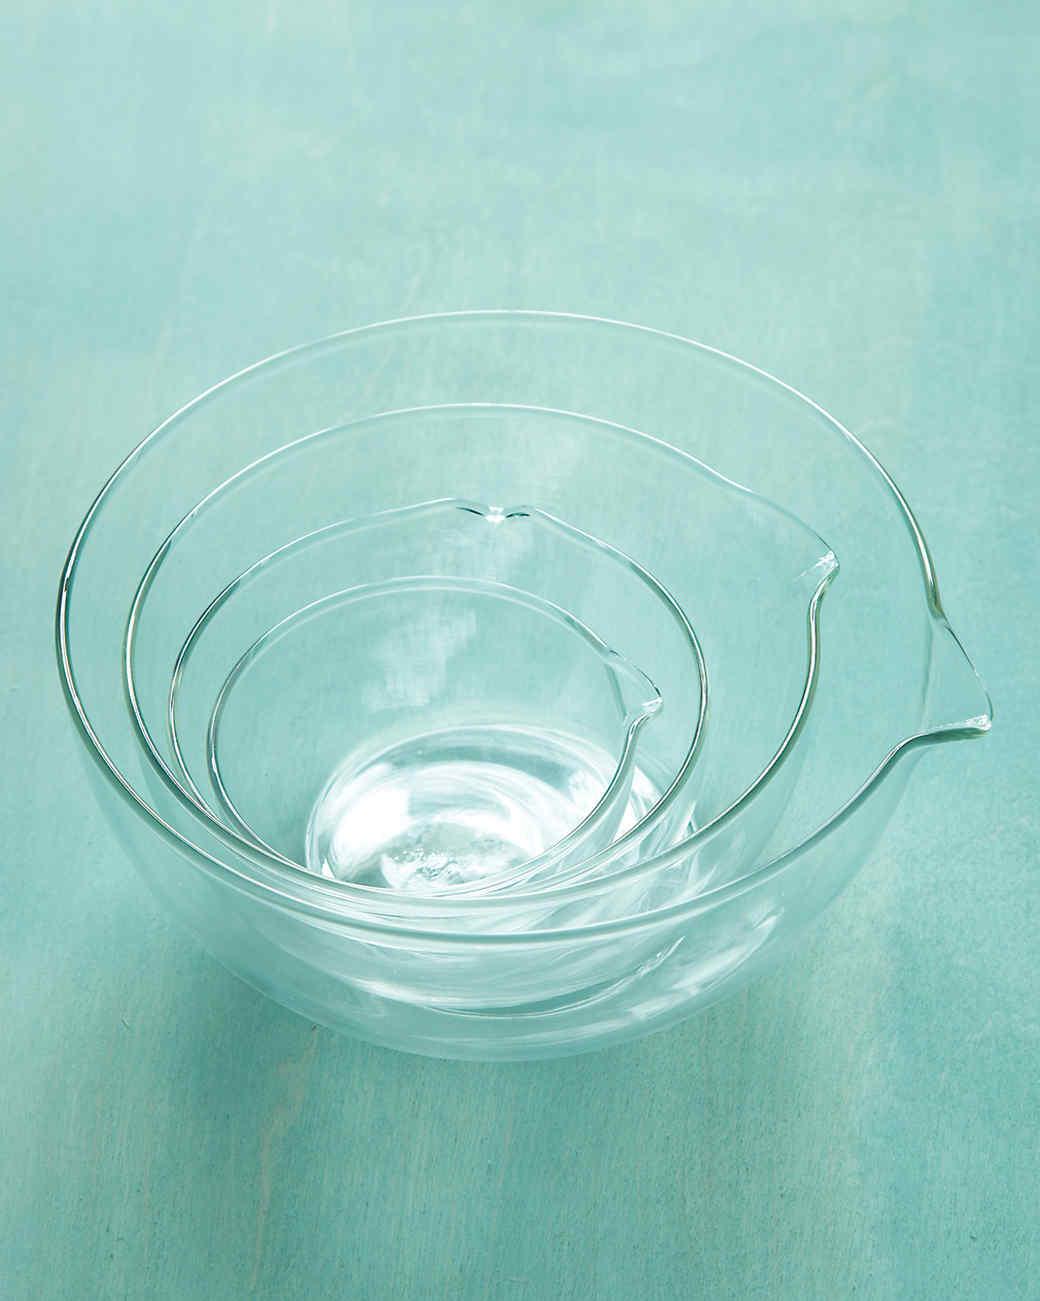 glass-bowls-md108967.jpg